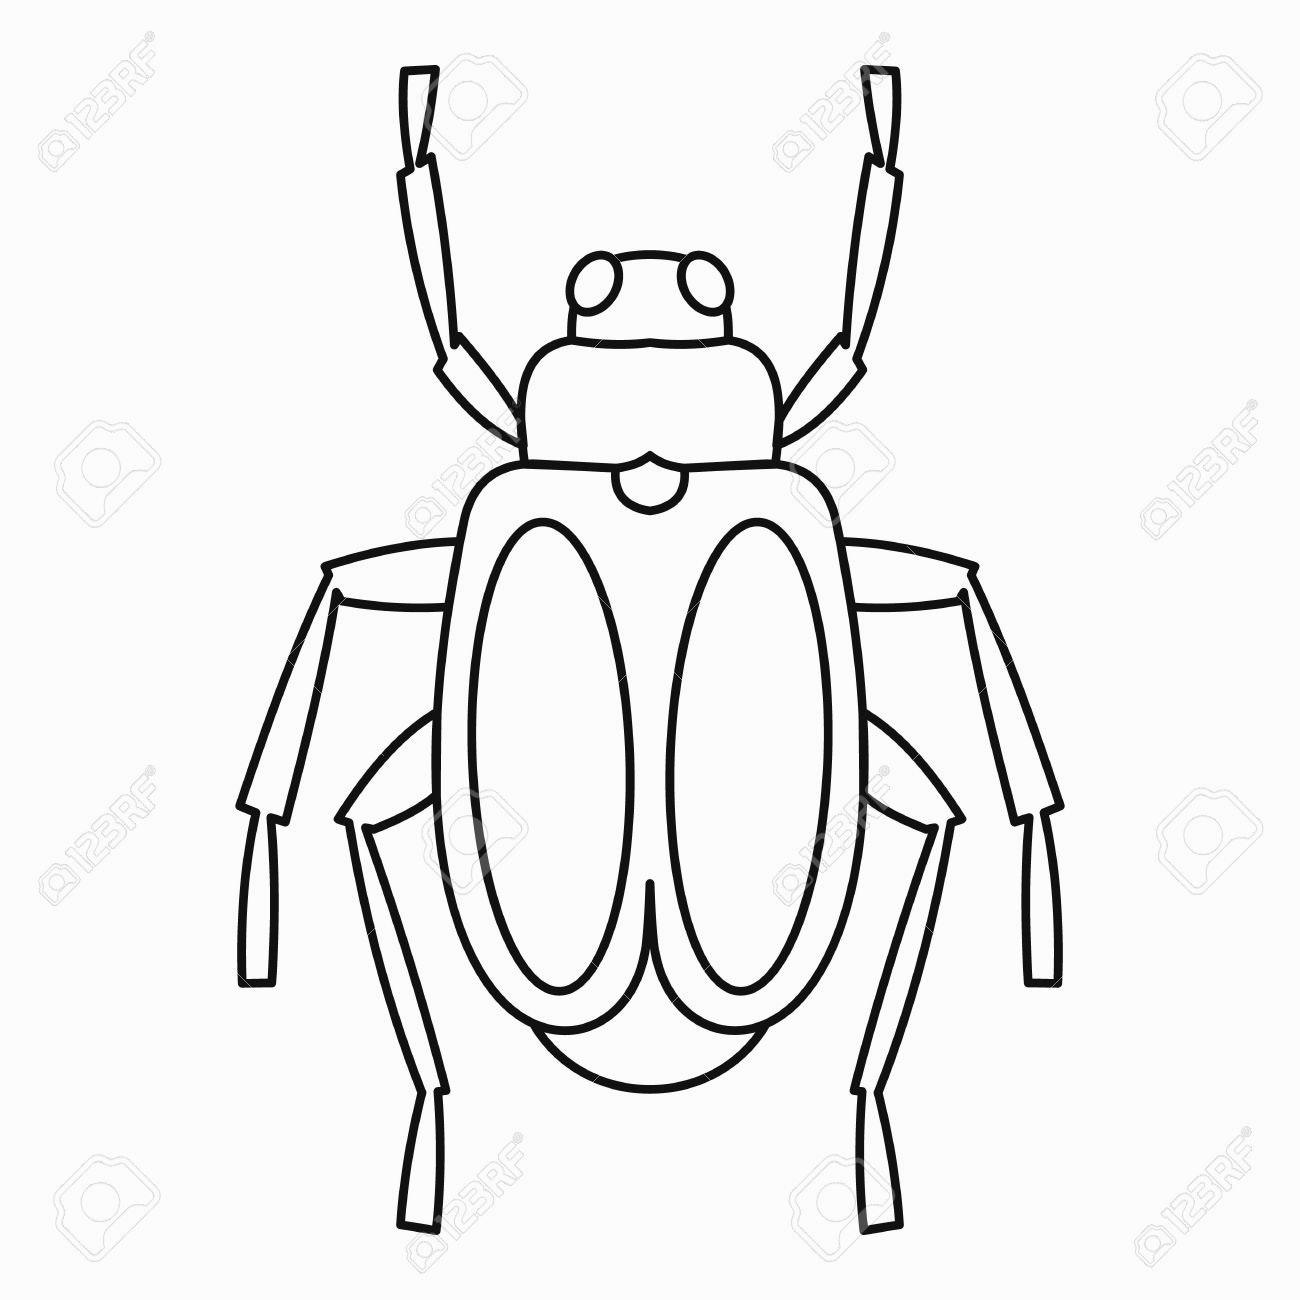 1300x1300 Bug Clipart Outline